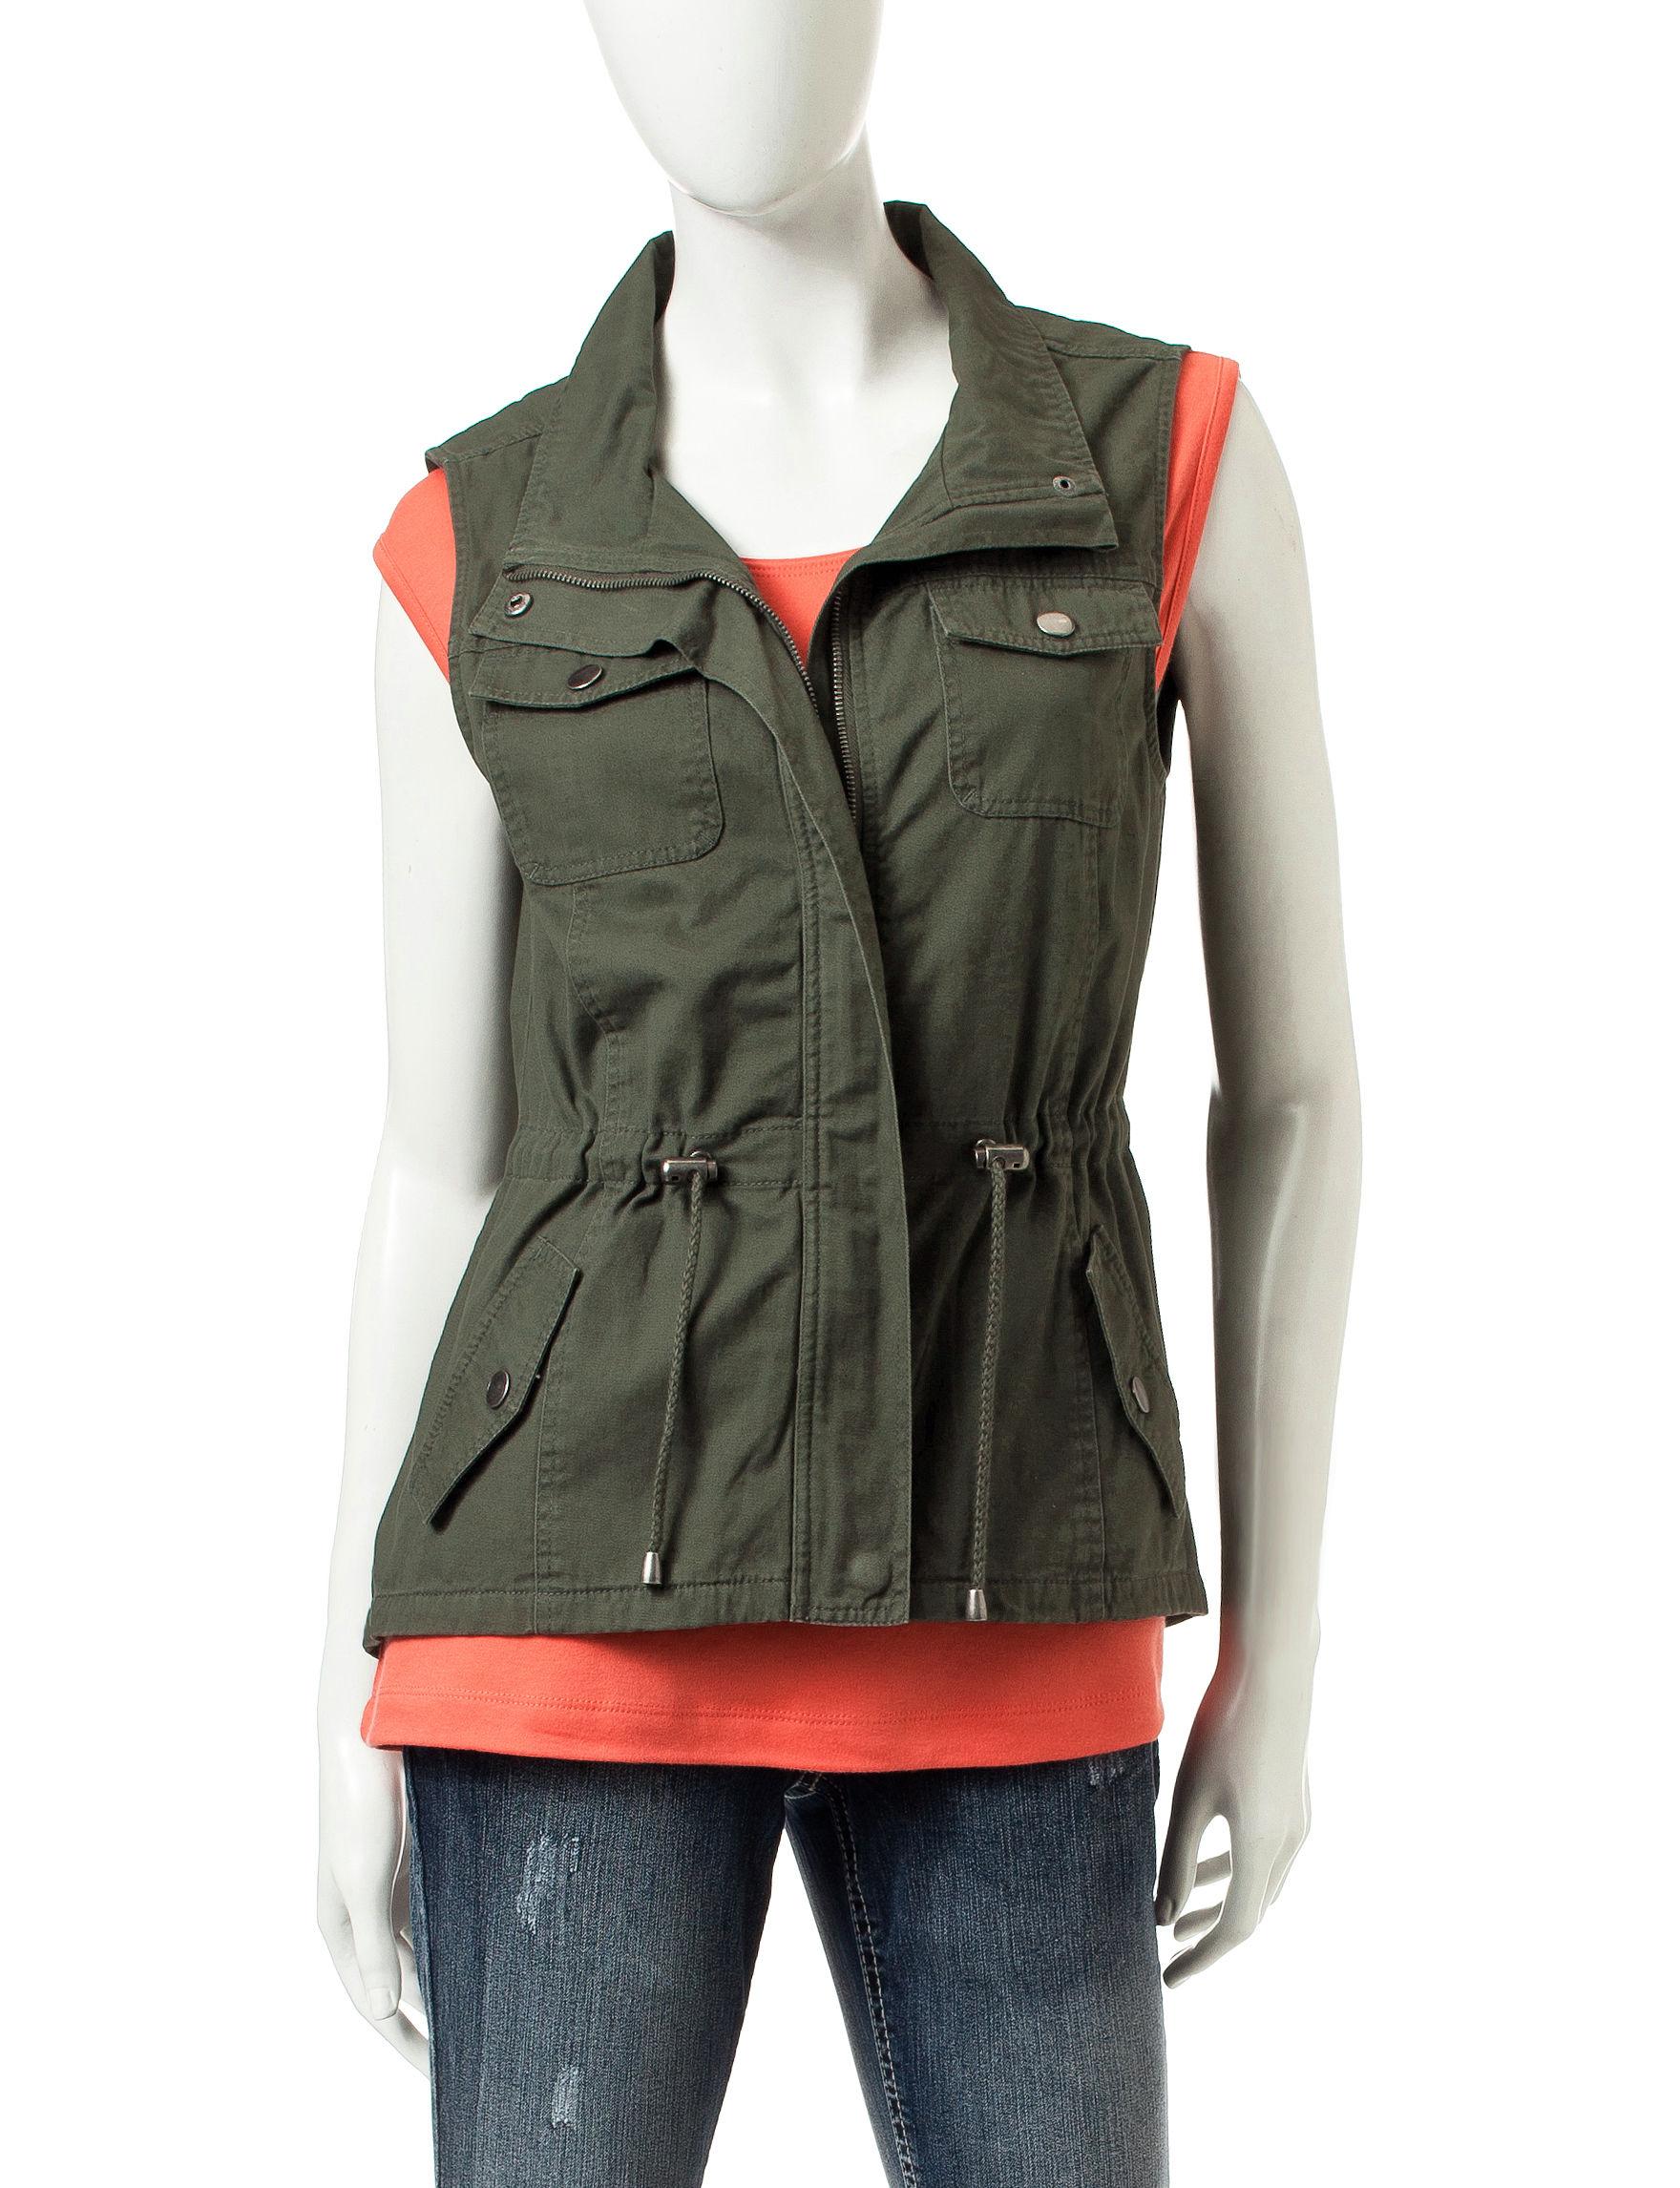 Ashley Olive Vests